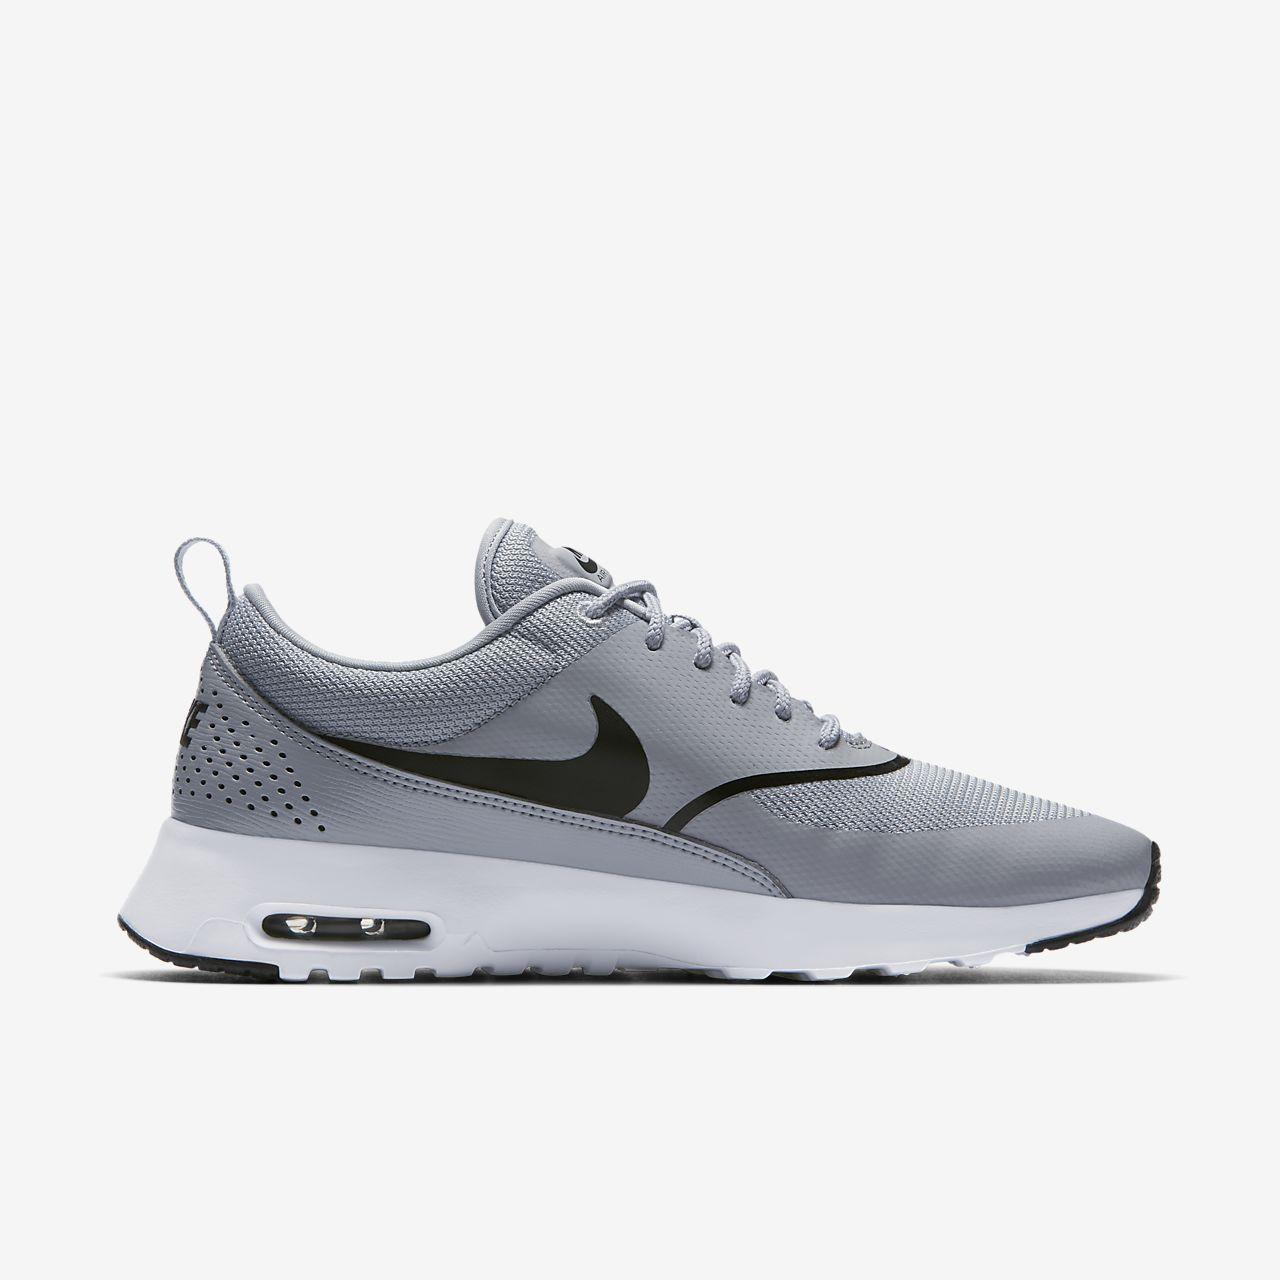 sports shoes d201e f81ed ... Chaussure Nike Air Max Thea pour Femme